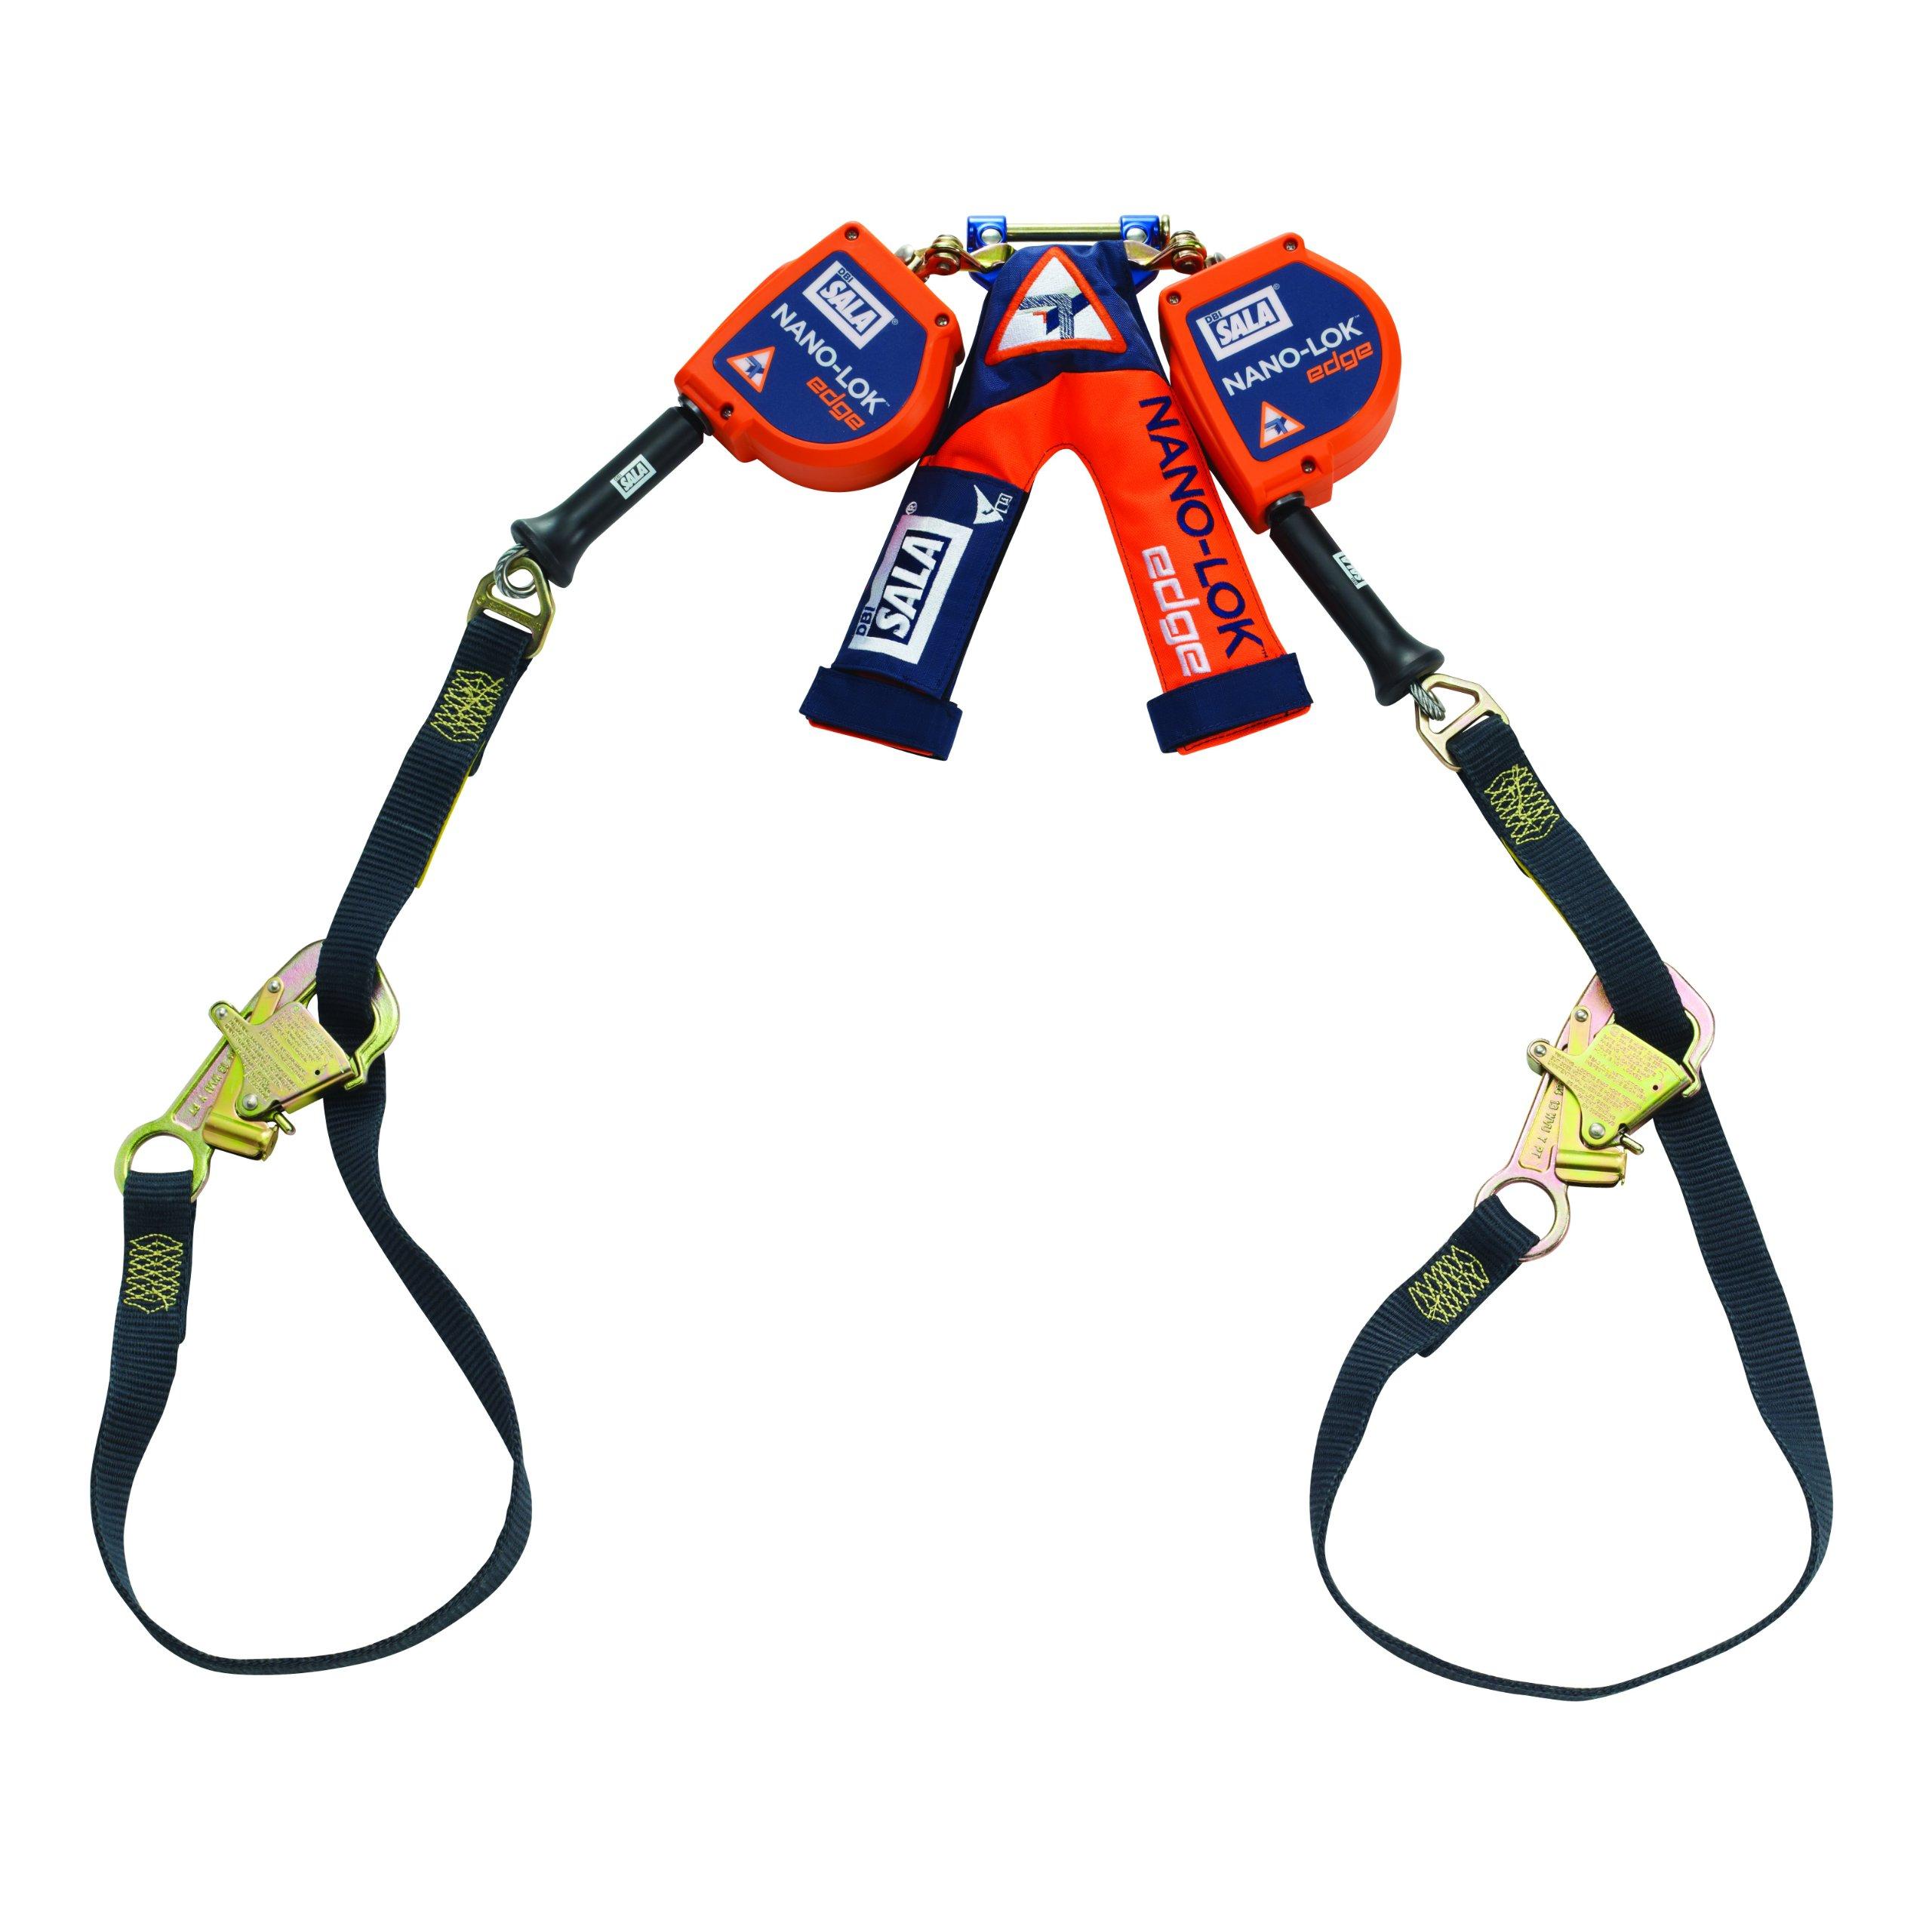 3M DBI-SALA Nano-Lok Edge 3500228 SRL, 9-' Double-Leg, Leading and Sharp Edge Wrap Bax Hook, Quick Connector for Harness Mount